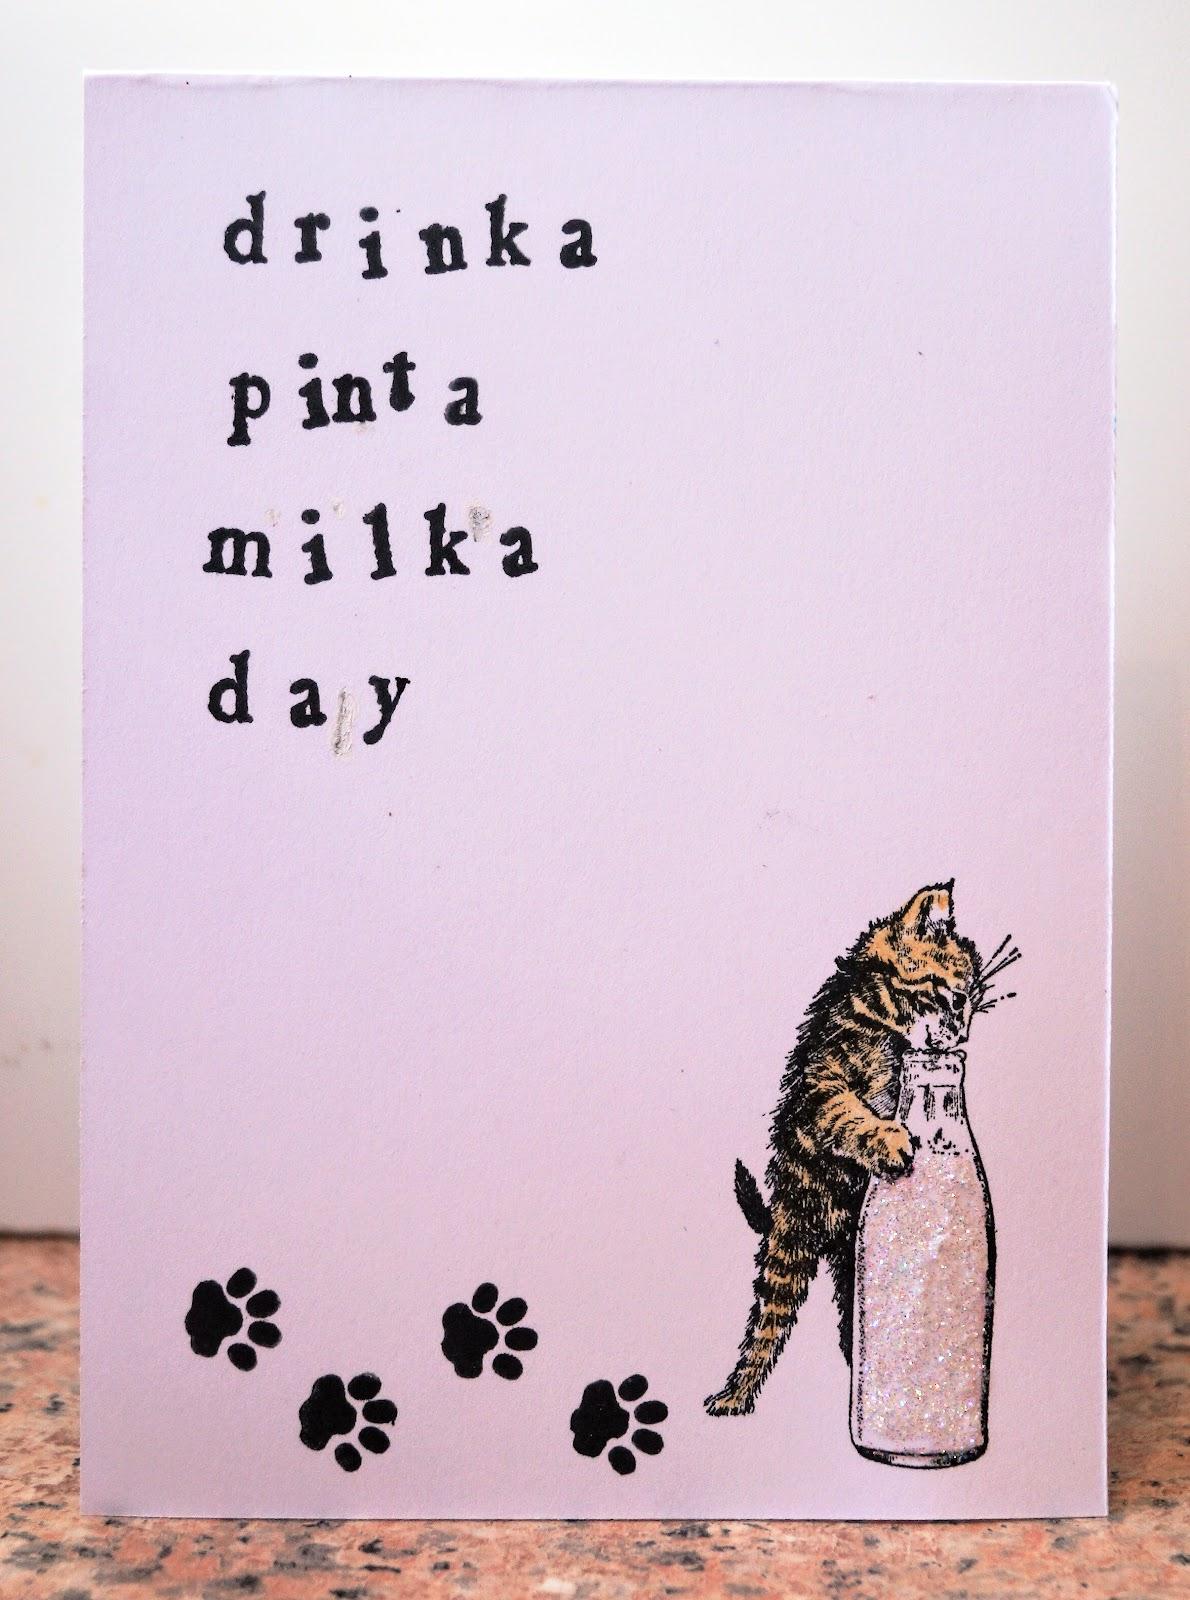 Onions And Paper Drinka Pinta Milka Day